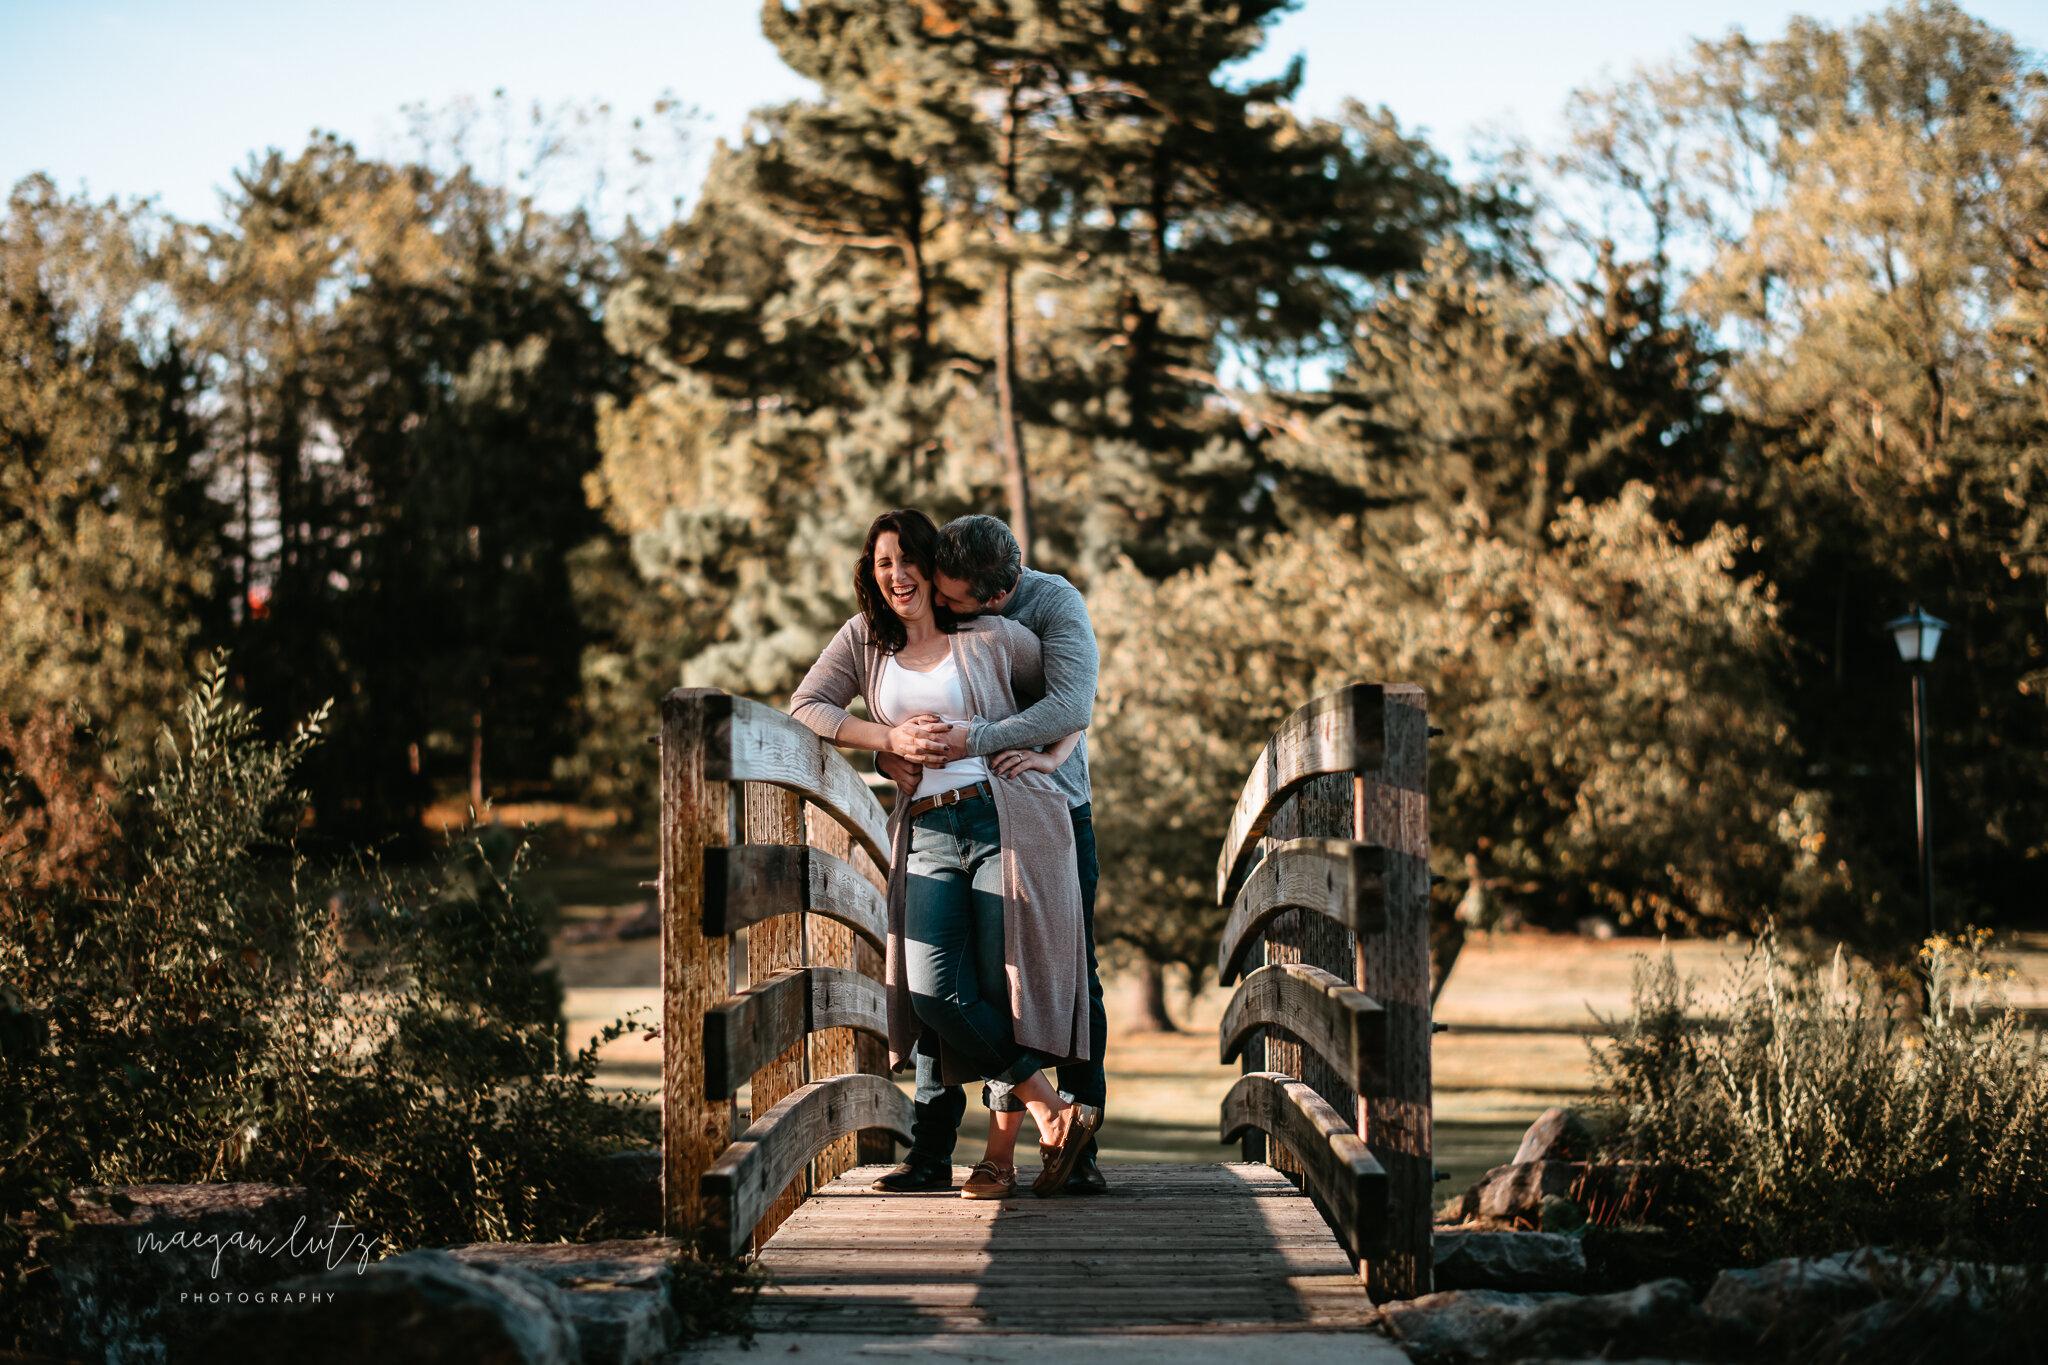 NEPA-Lehigh-Valley-Wedding-Engagement-photographer-at-the-rose-garden-allentown-PA-11.jpg